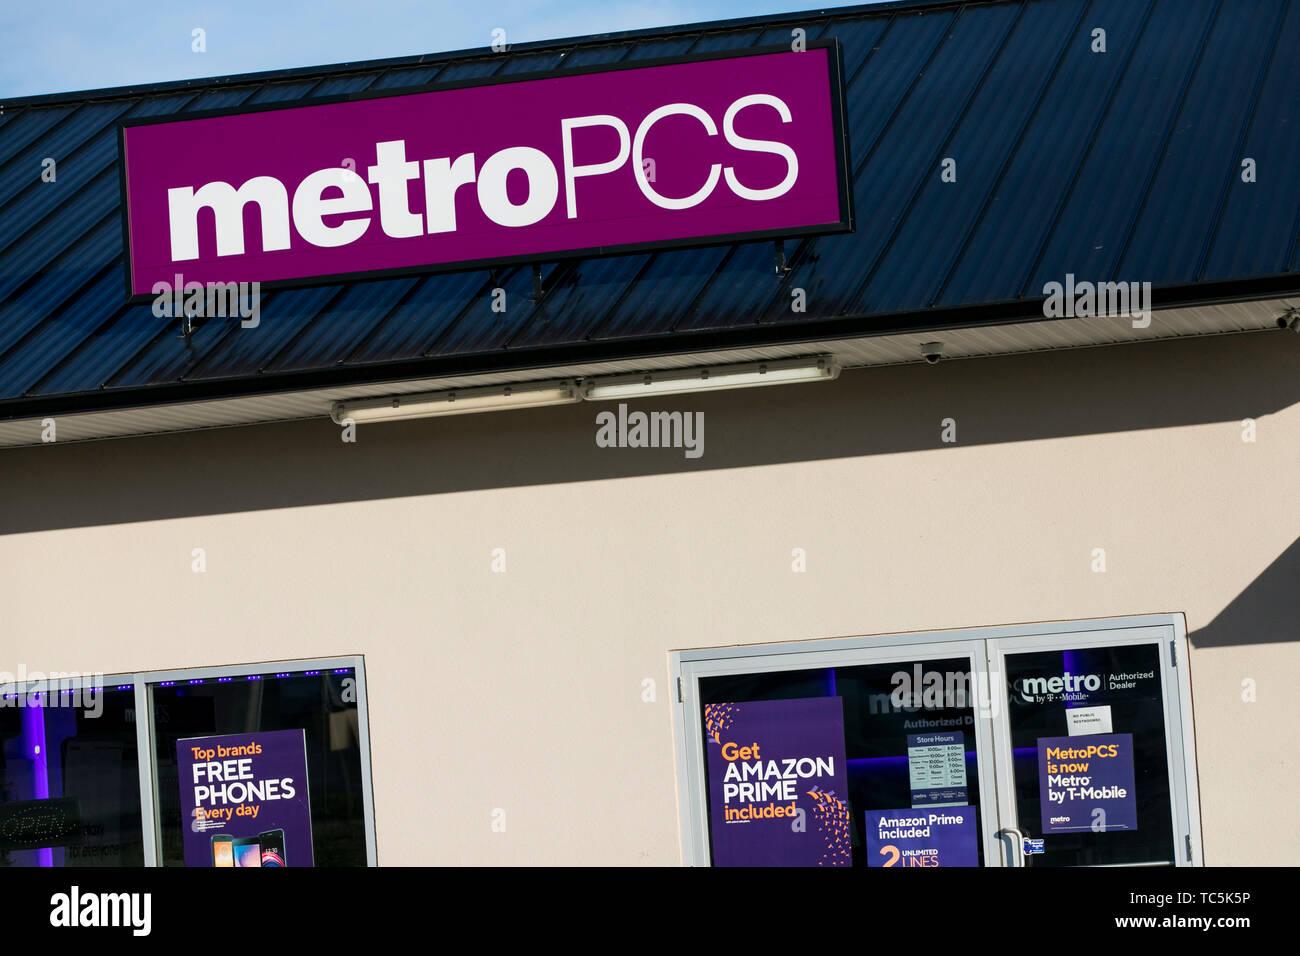 Metro Pcs Stock Photos & Metro Pcs Stock Images - Alamy